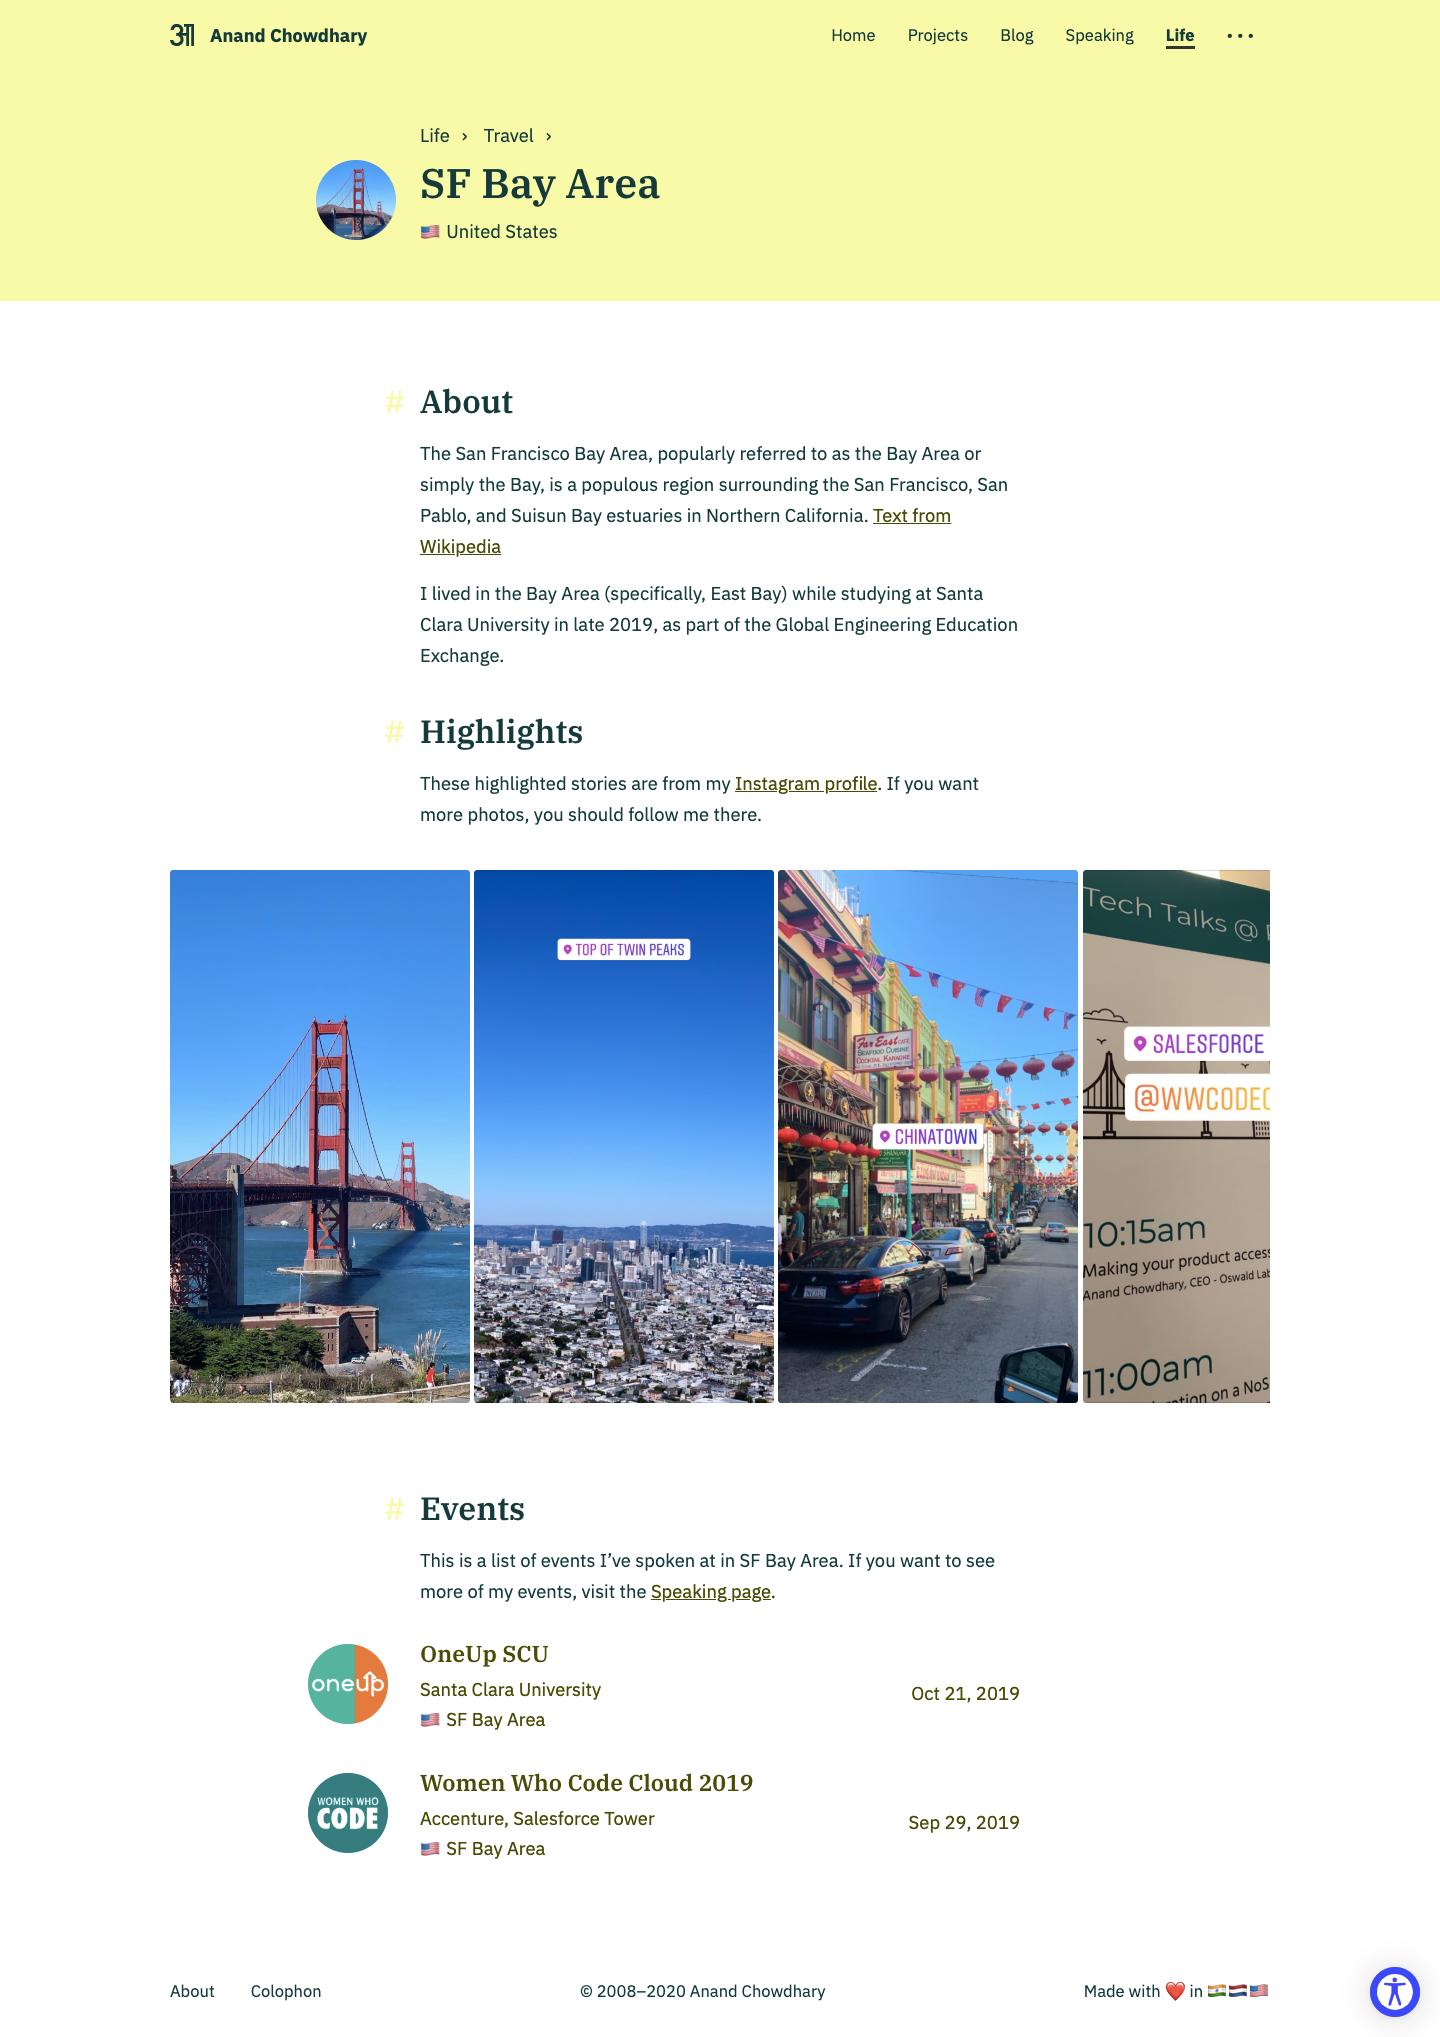 Screenshot of City page